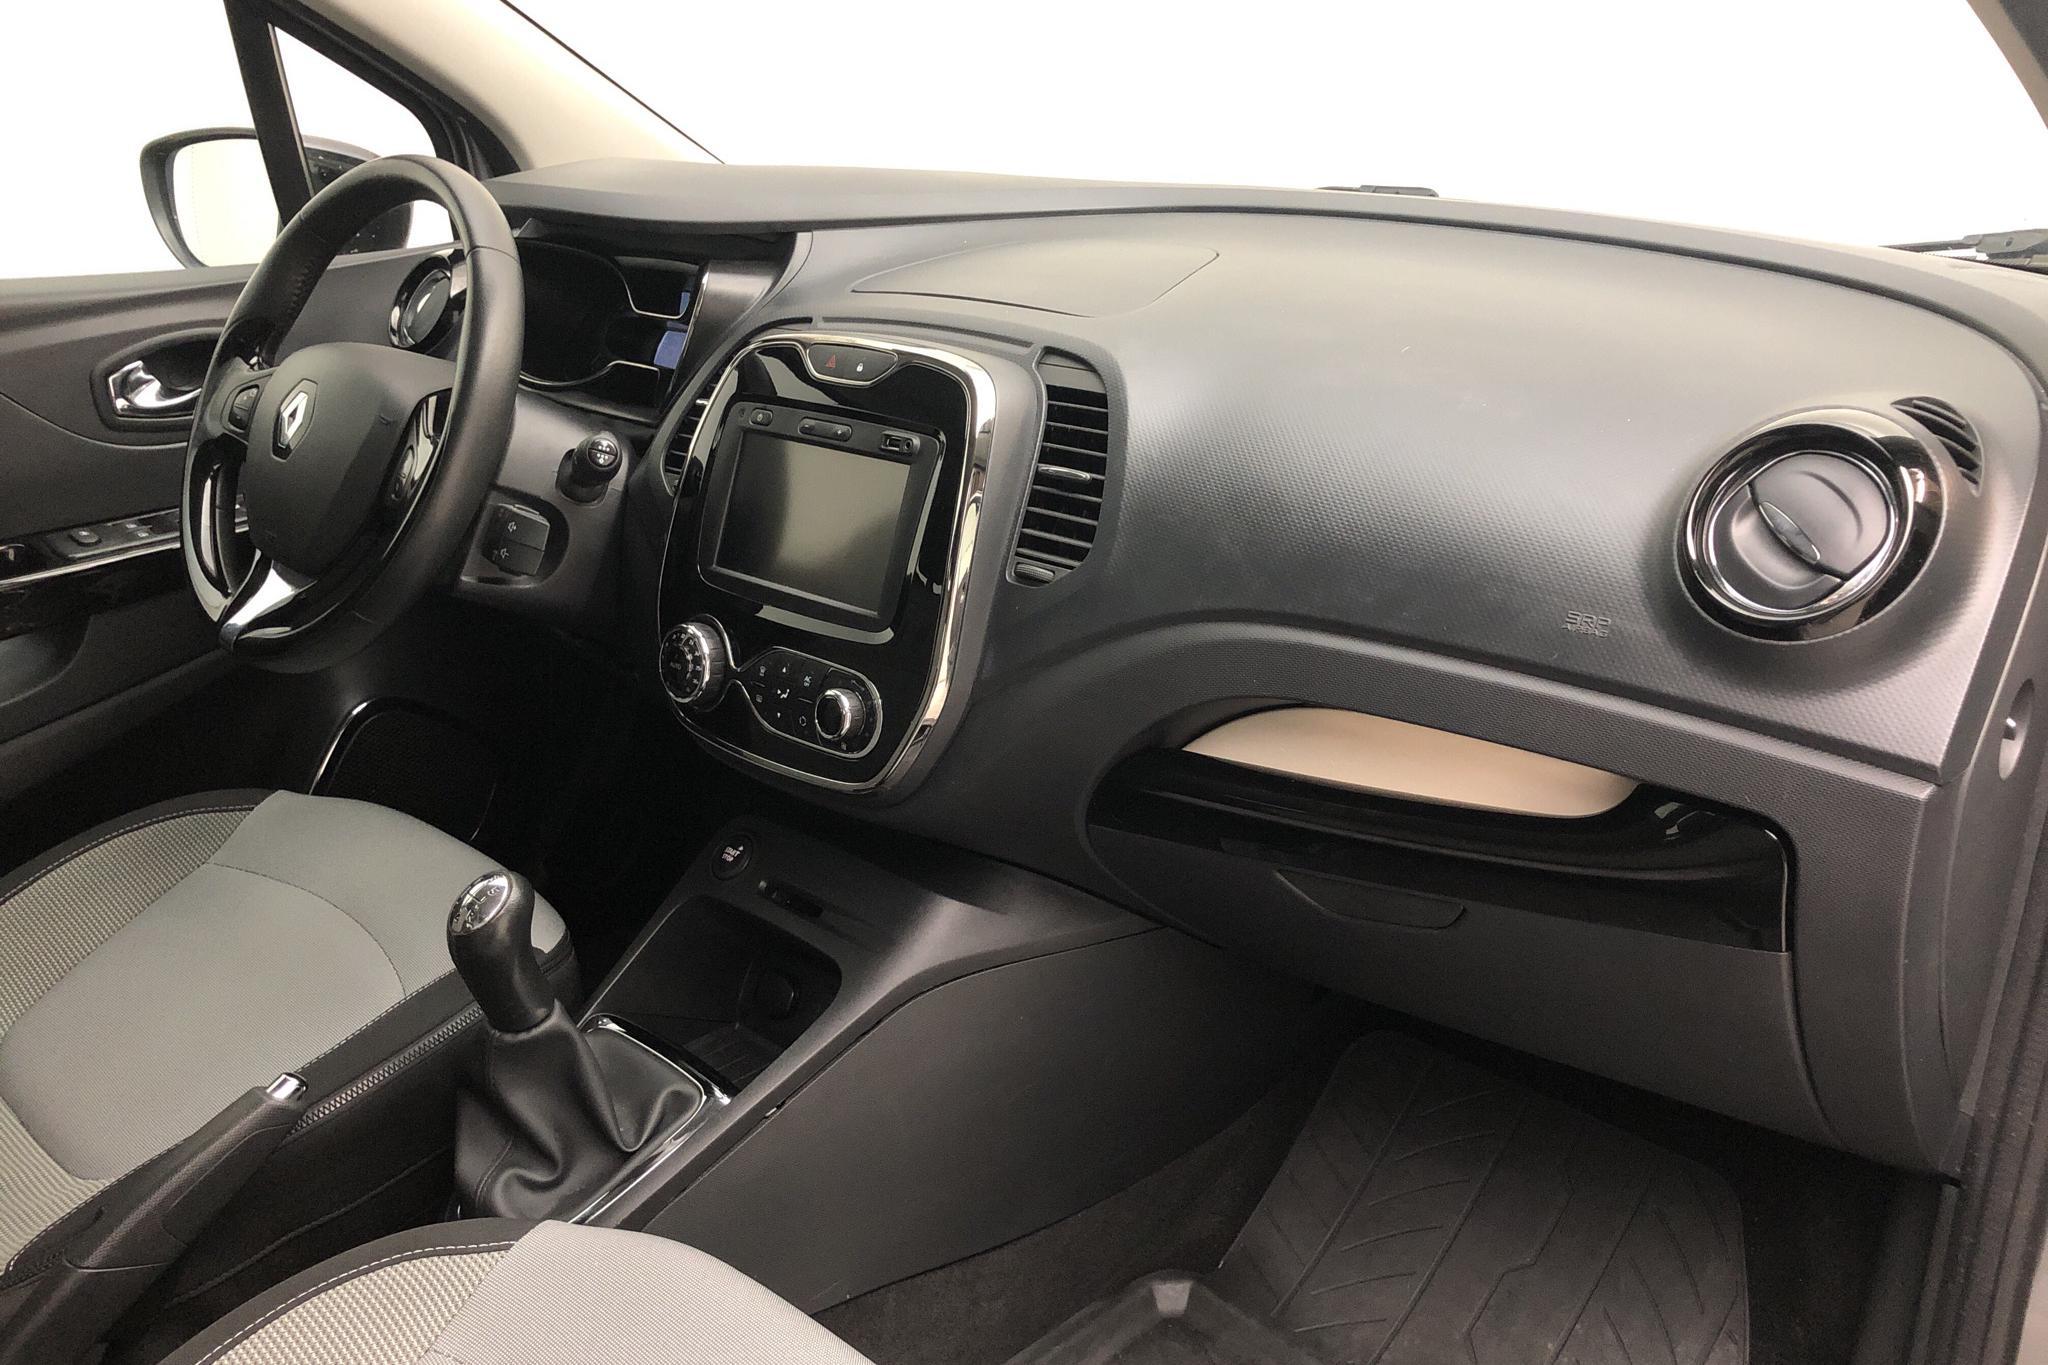 Renault Captur 0.9 TCe (90hk) - 85 330 km - Manual - 2014